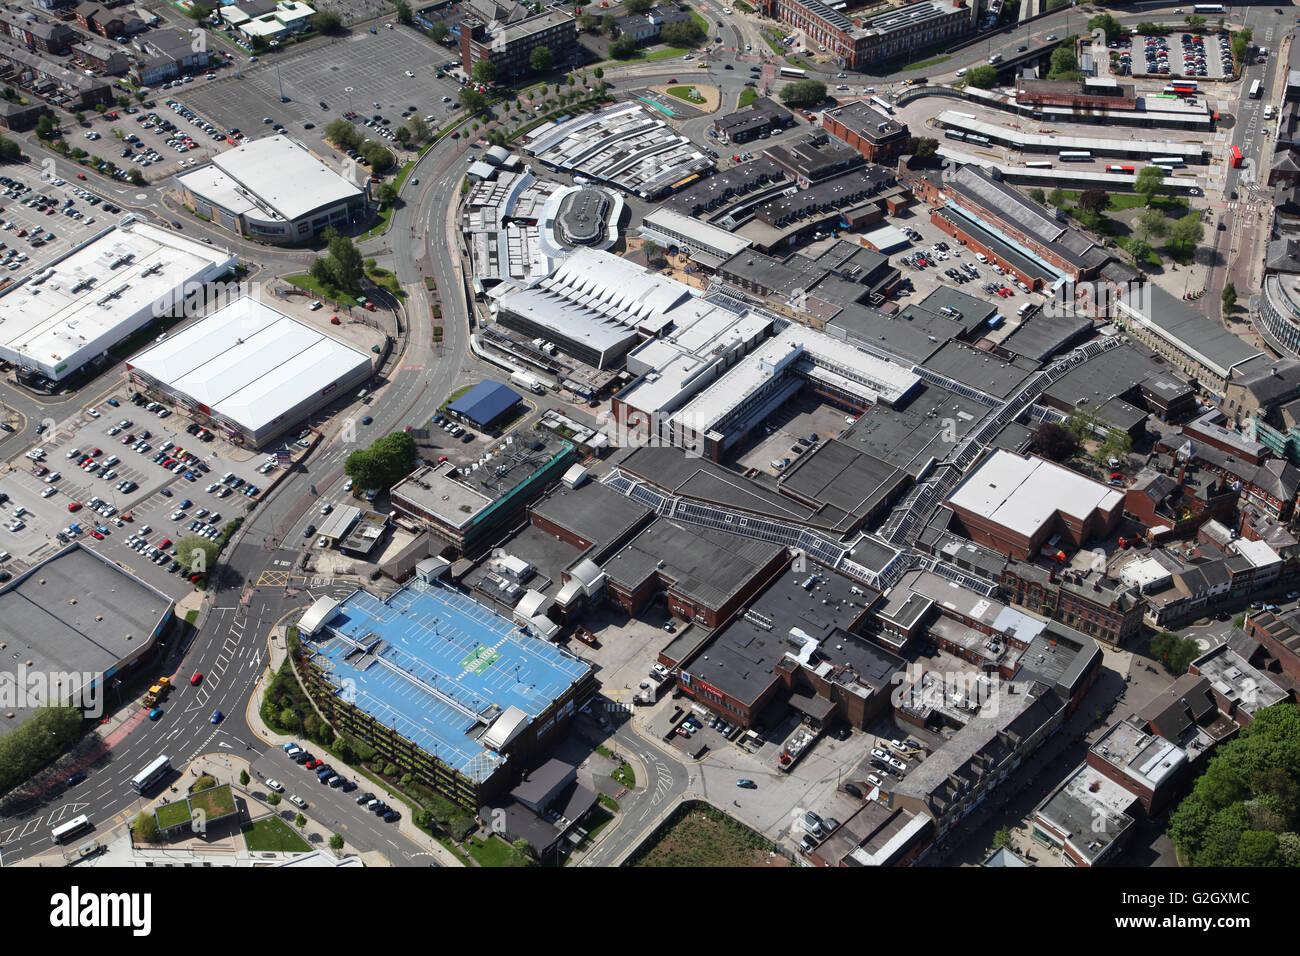 aerial view of Bury town centre, Lancashire, UK - Stock Image